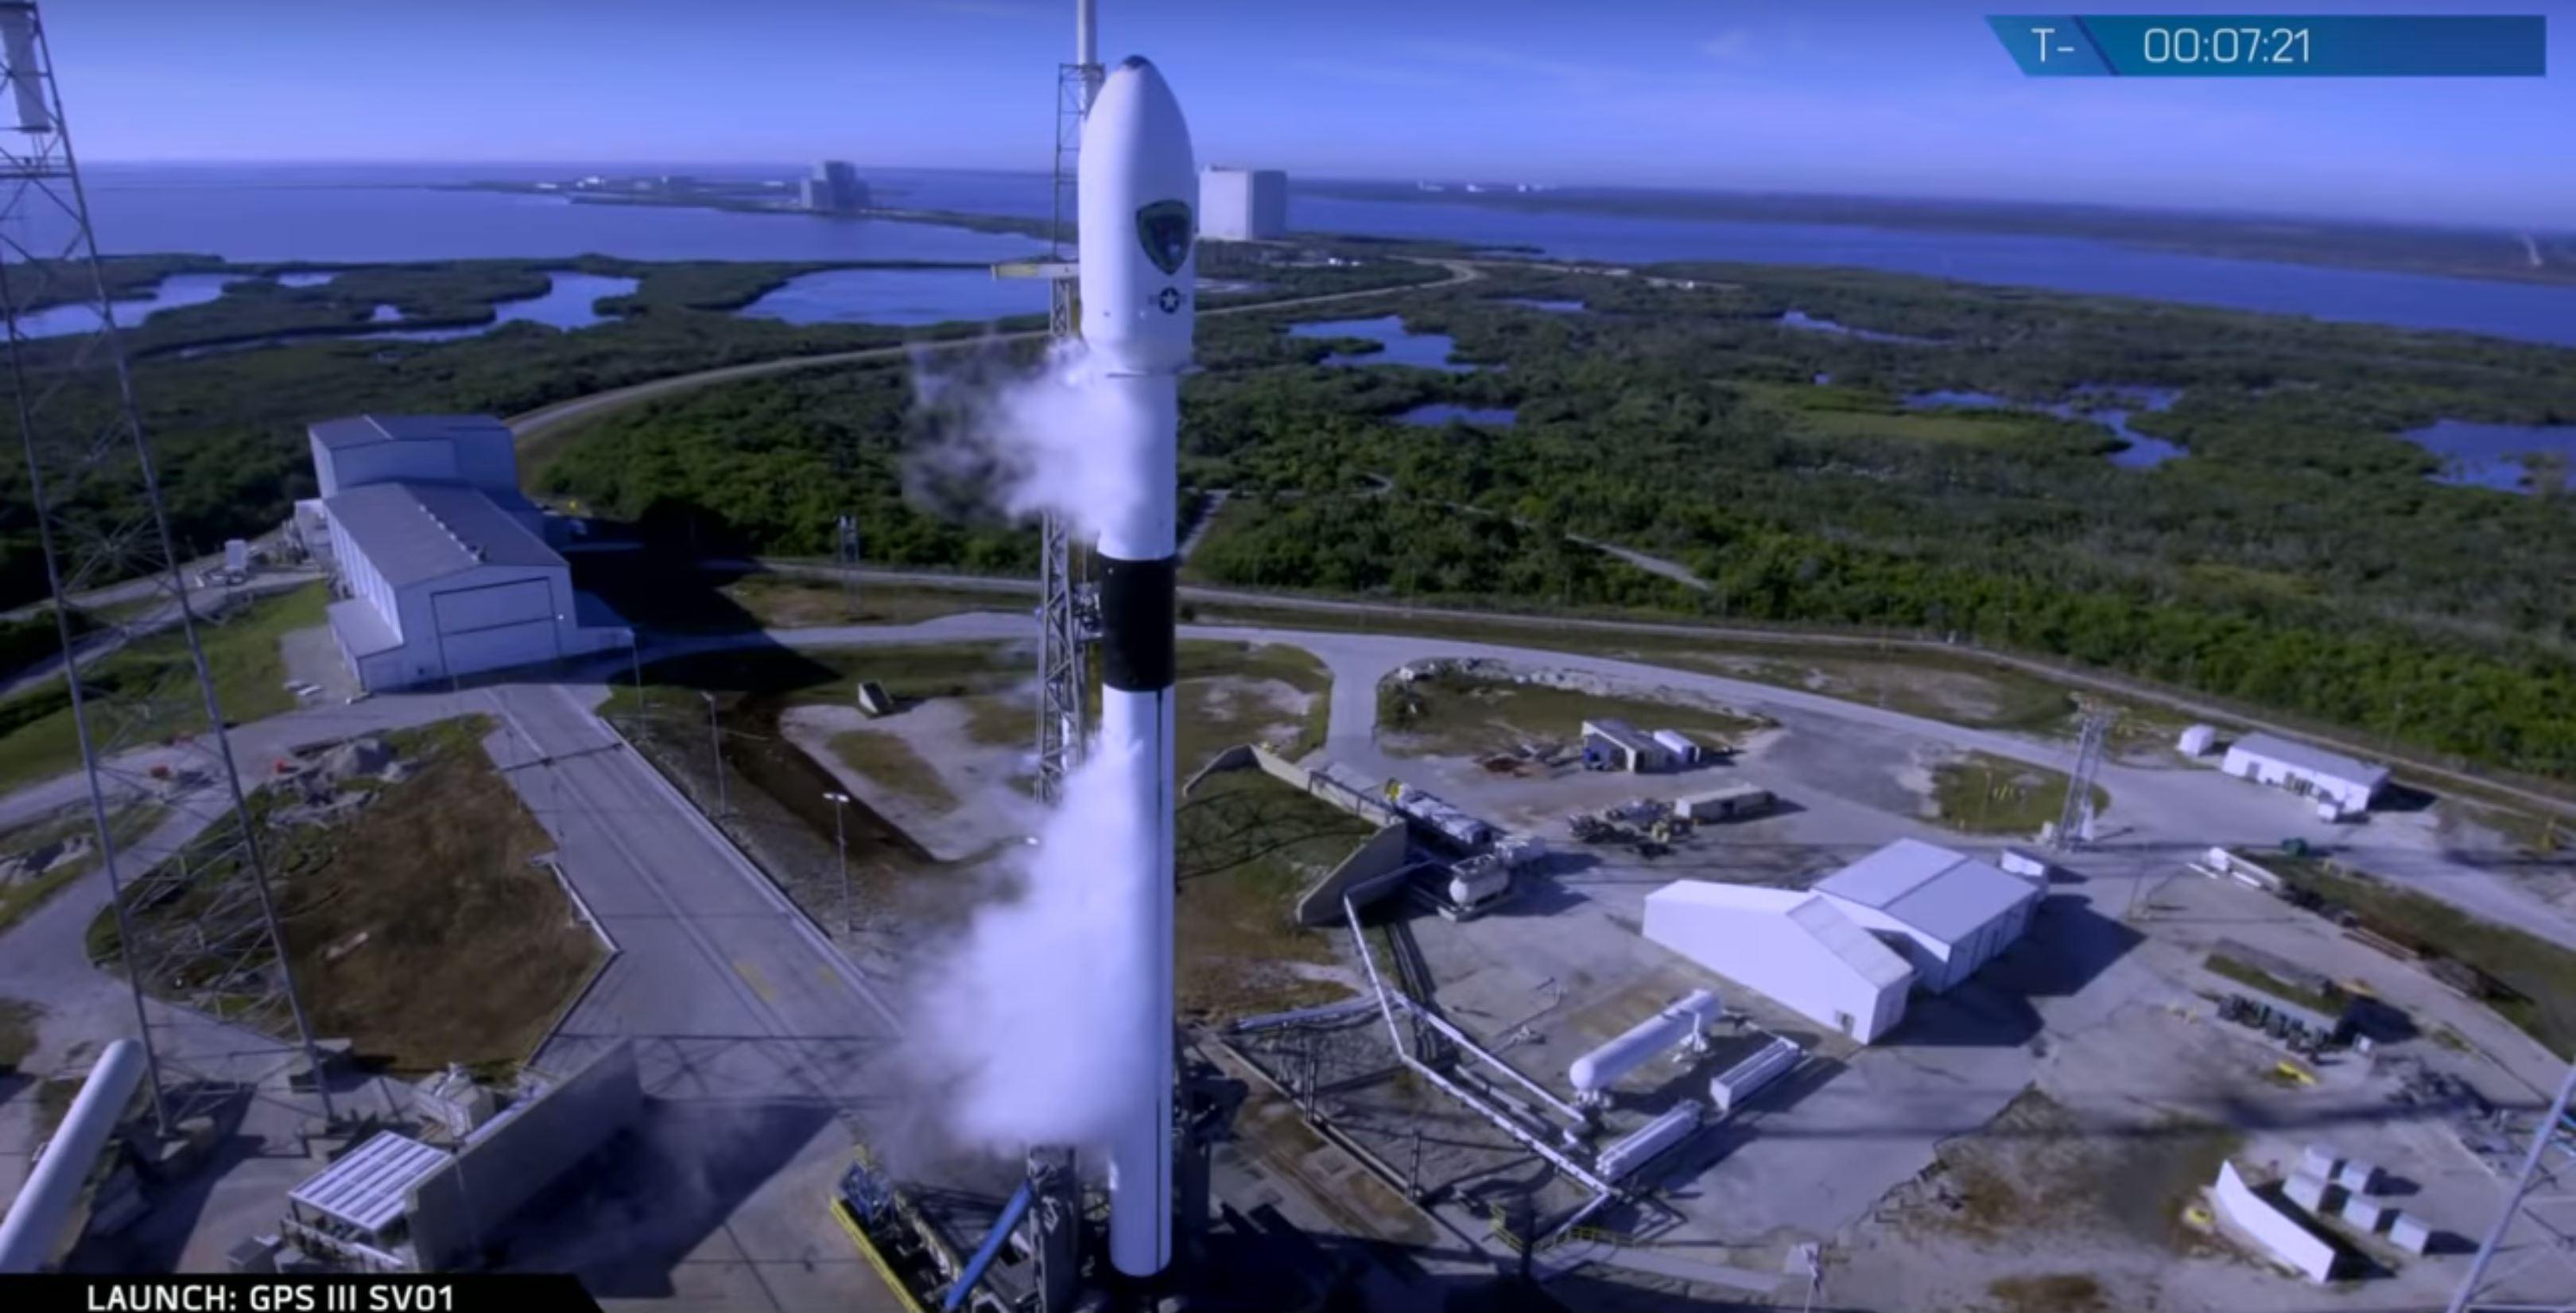 Falcon 9 B1054 GPS III SV01 prelaunch (SpaceX) 2